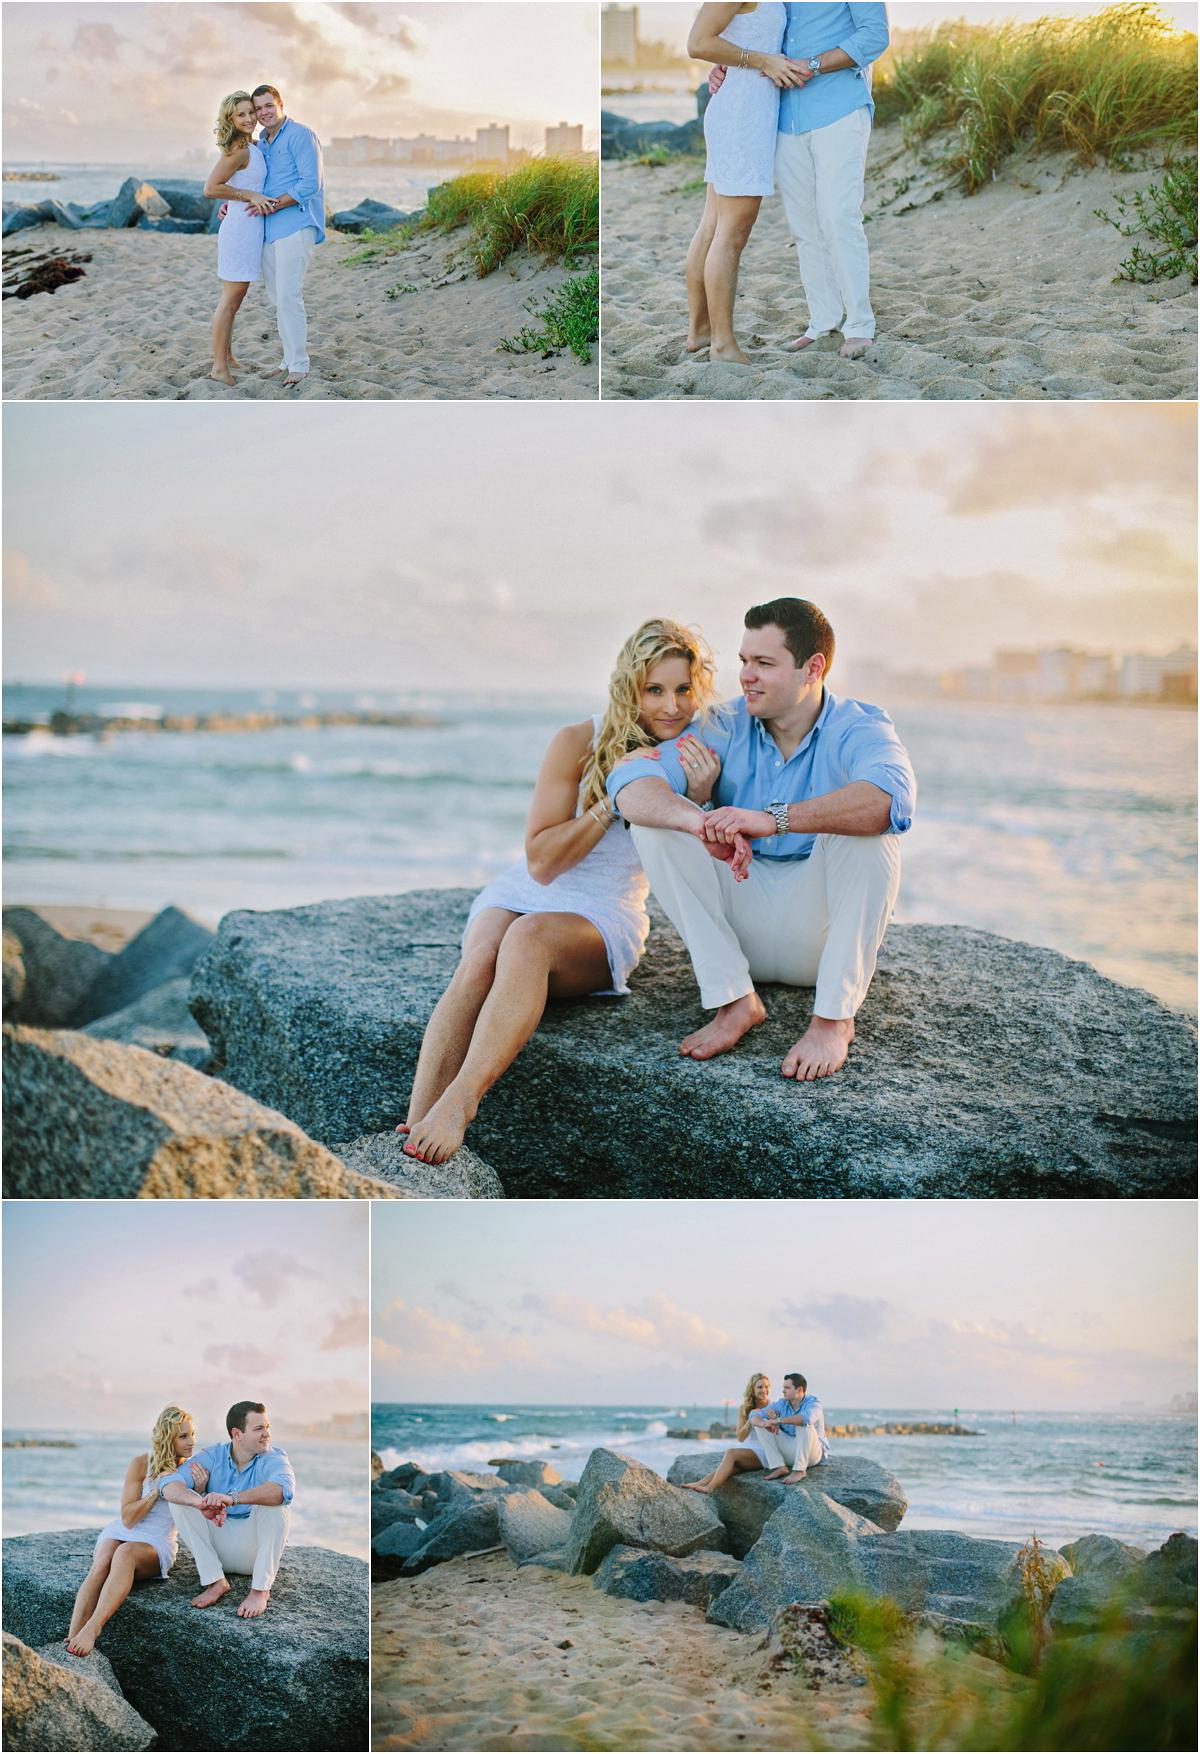 Hillsboro_Beach_Club_engagement_Photos_0004